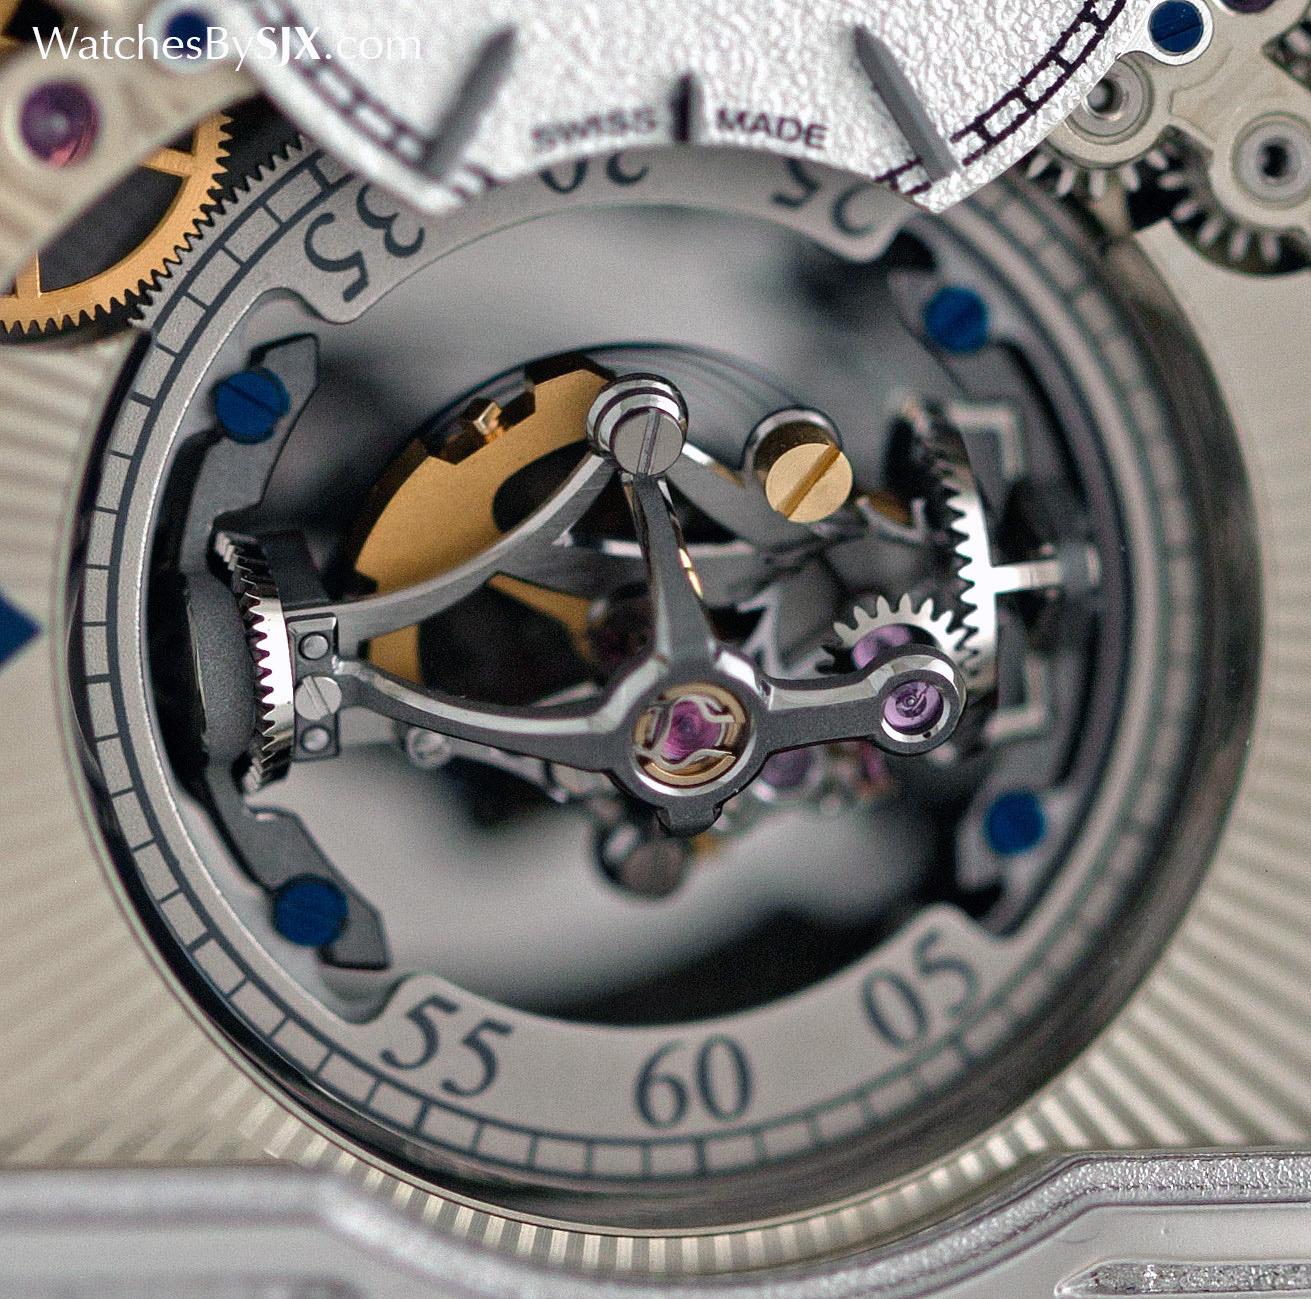 Jaeger-LeCoultre Reverso Tribute Gyrotourbillon platinum 7